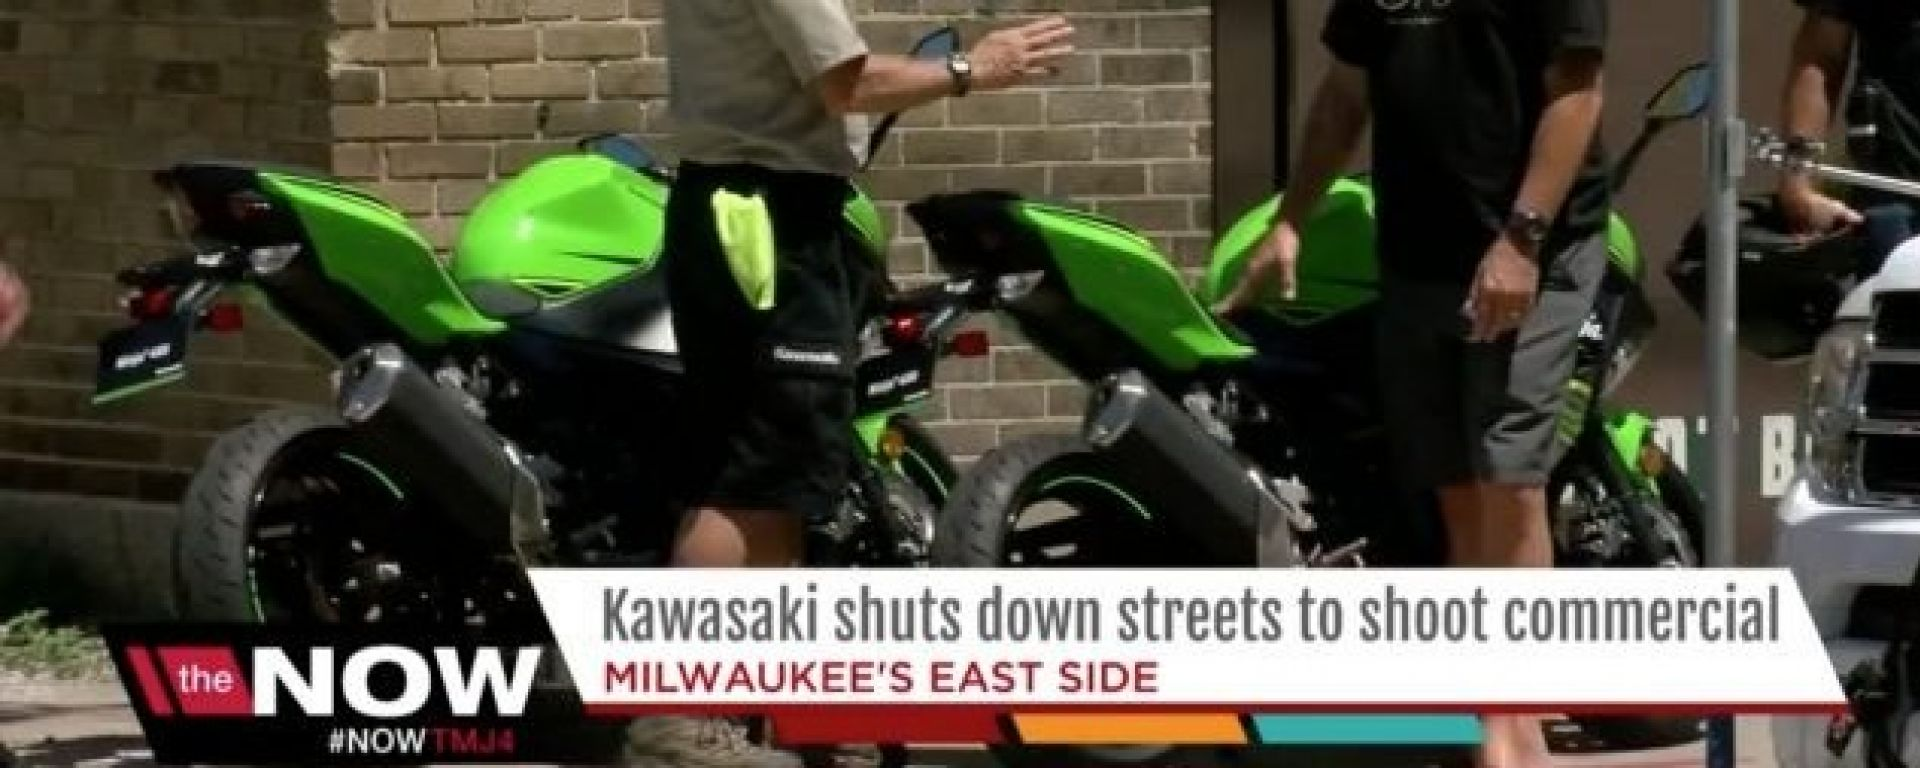 Nuova Kawasaki Ninja 400, ecco gli scatti rubati a Milwaukee